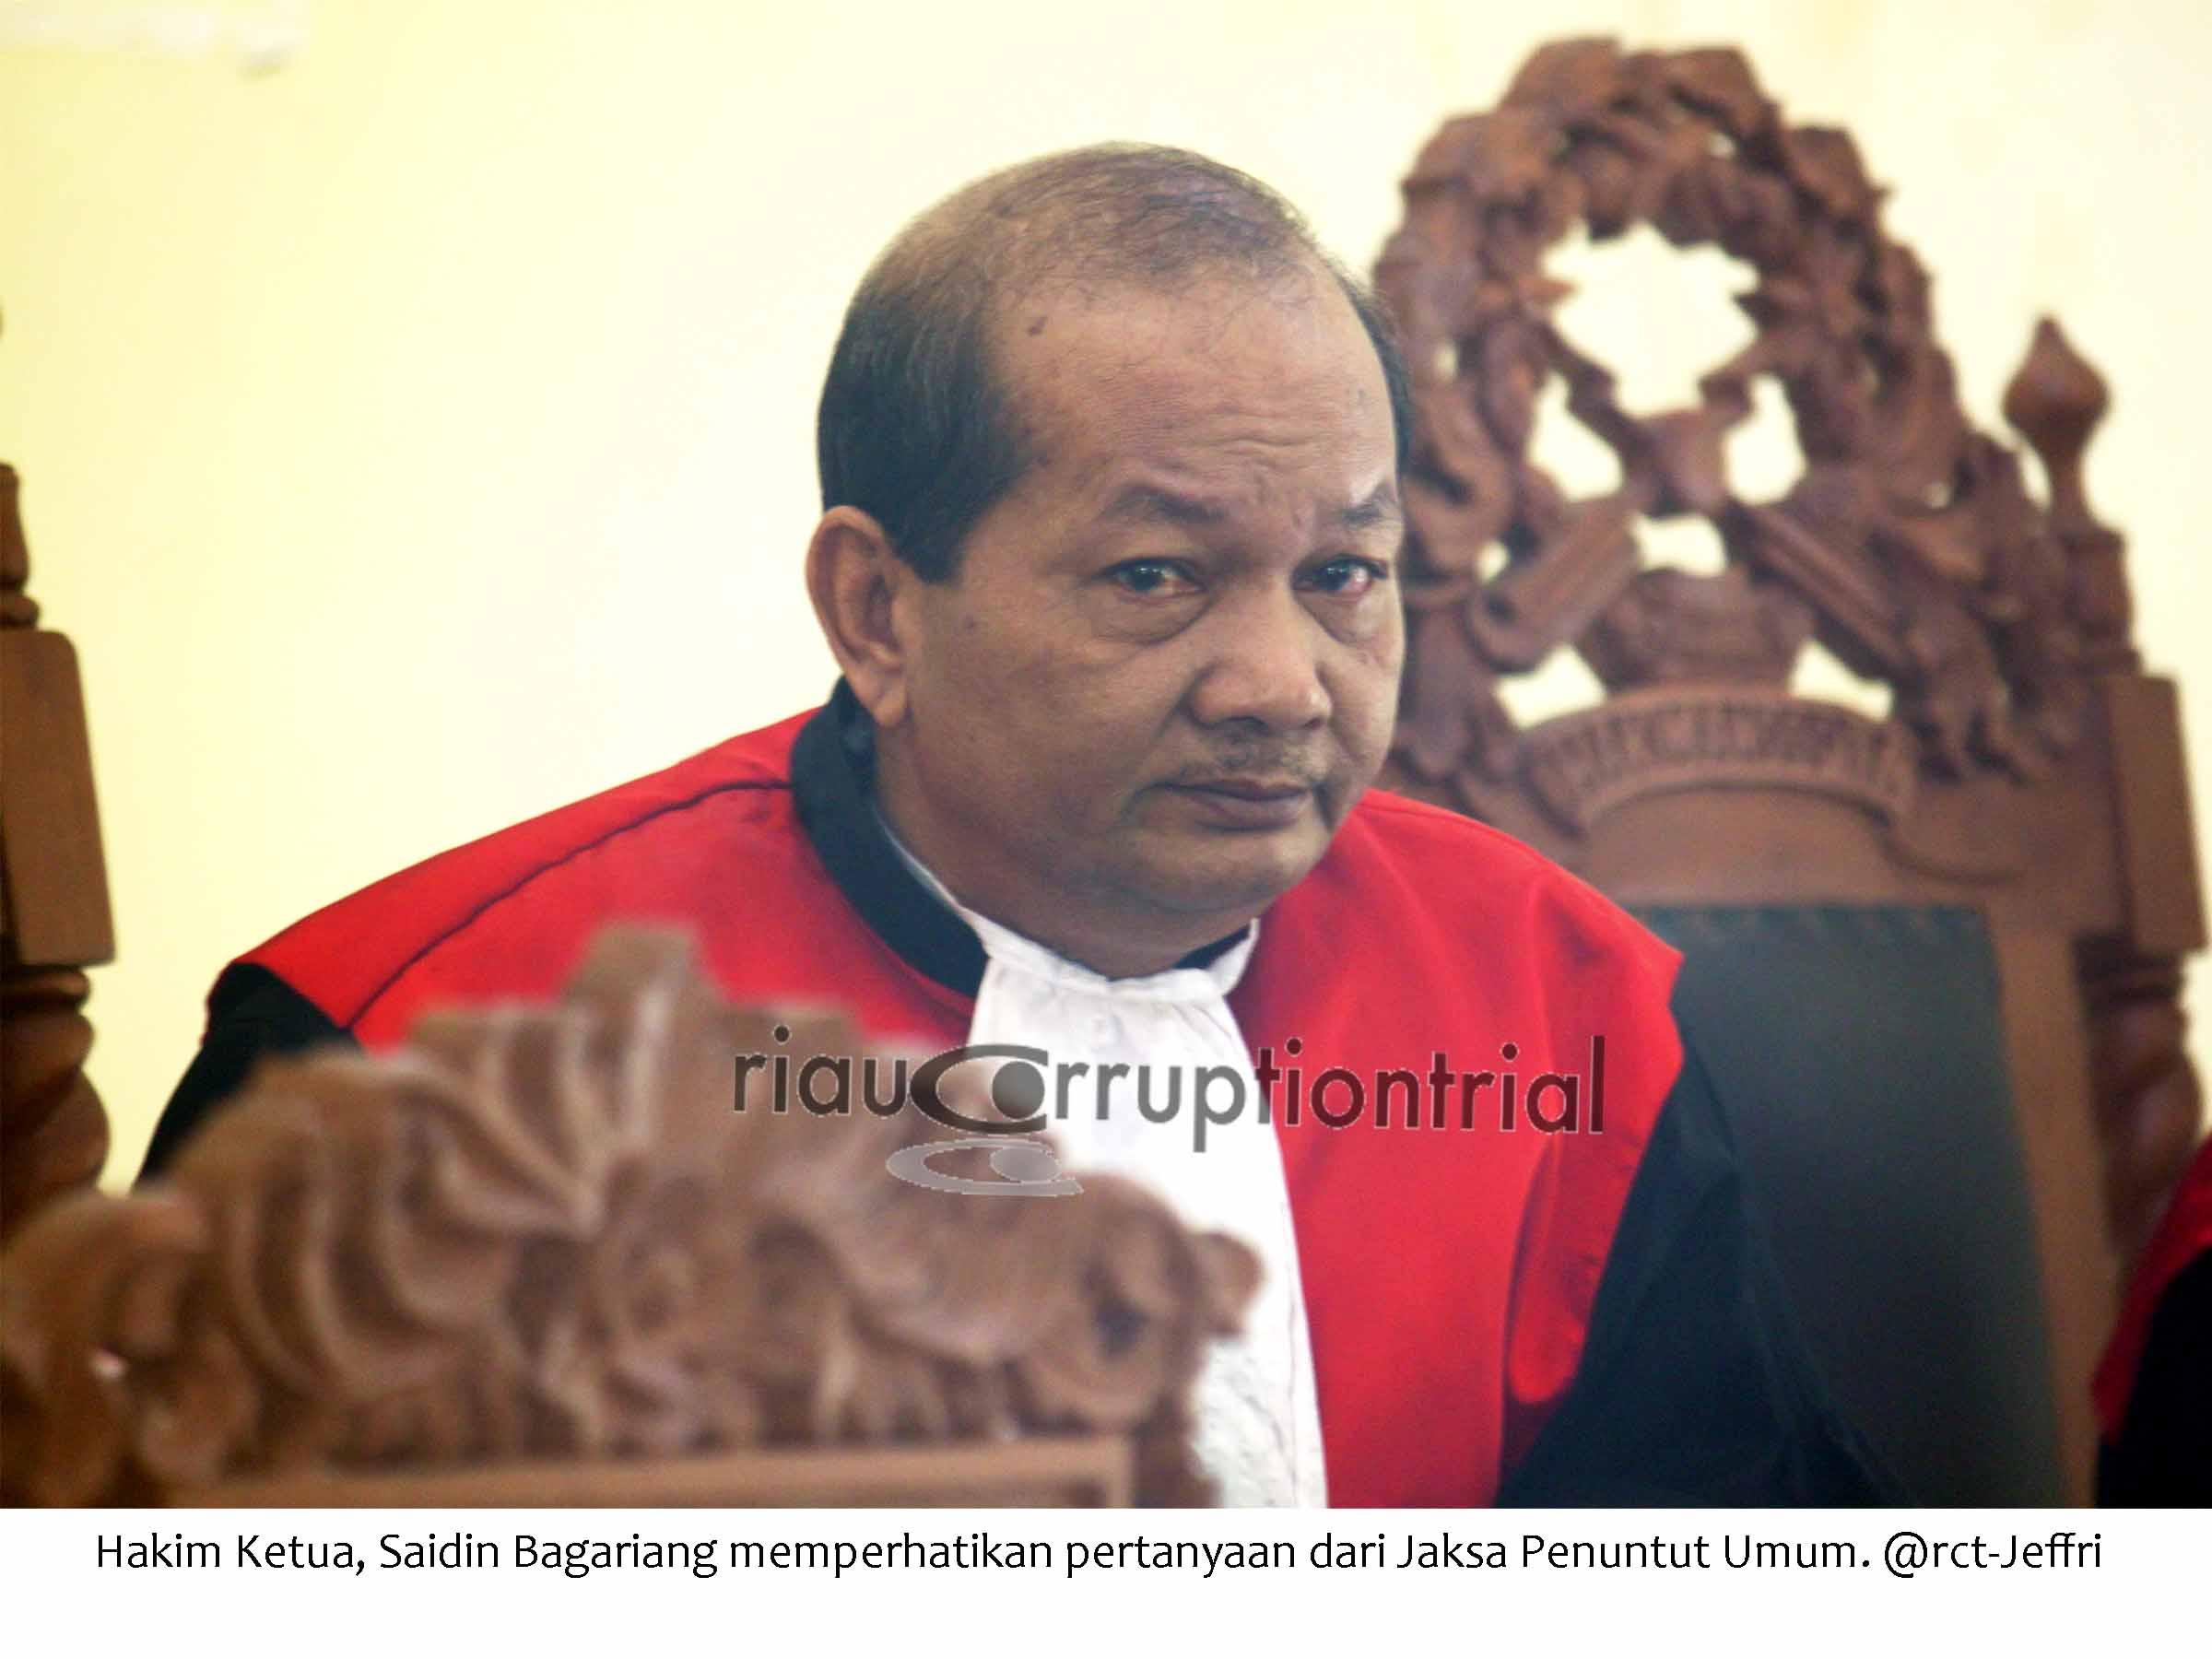 hakim ketua Saidin Bagariang